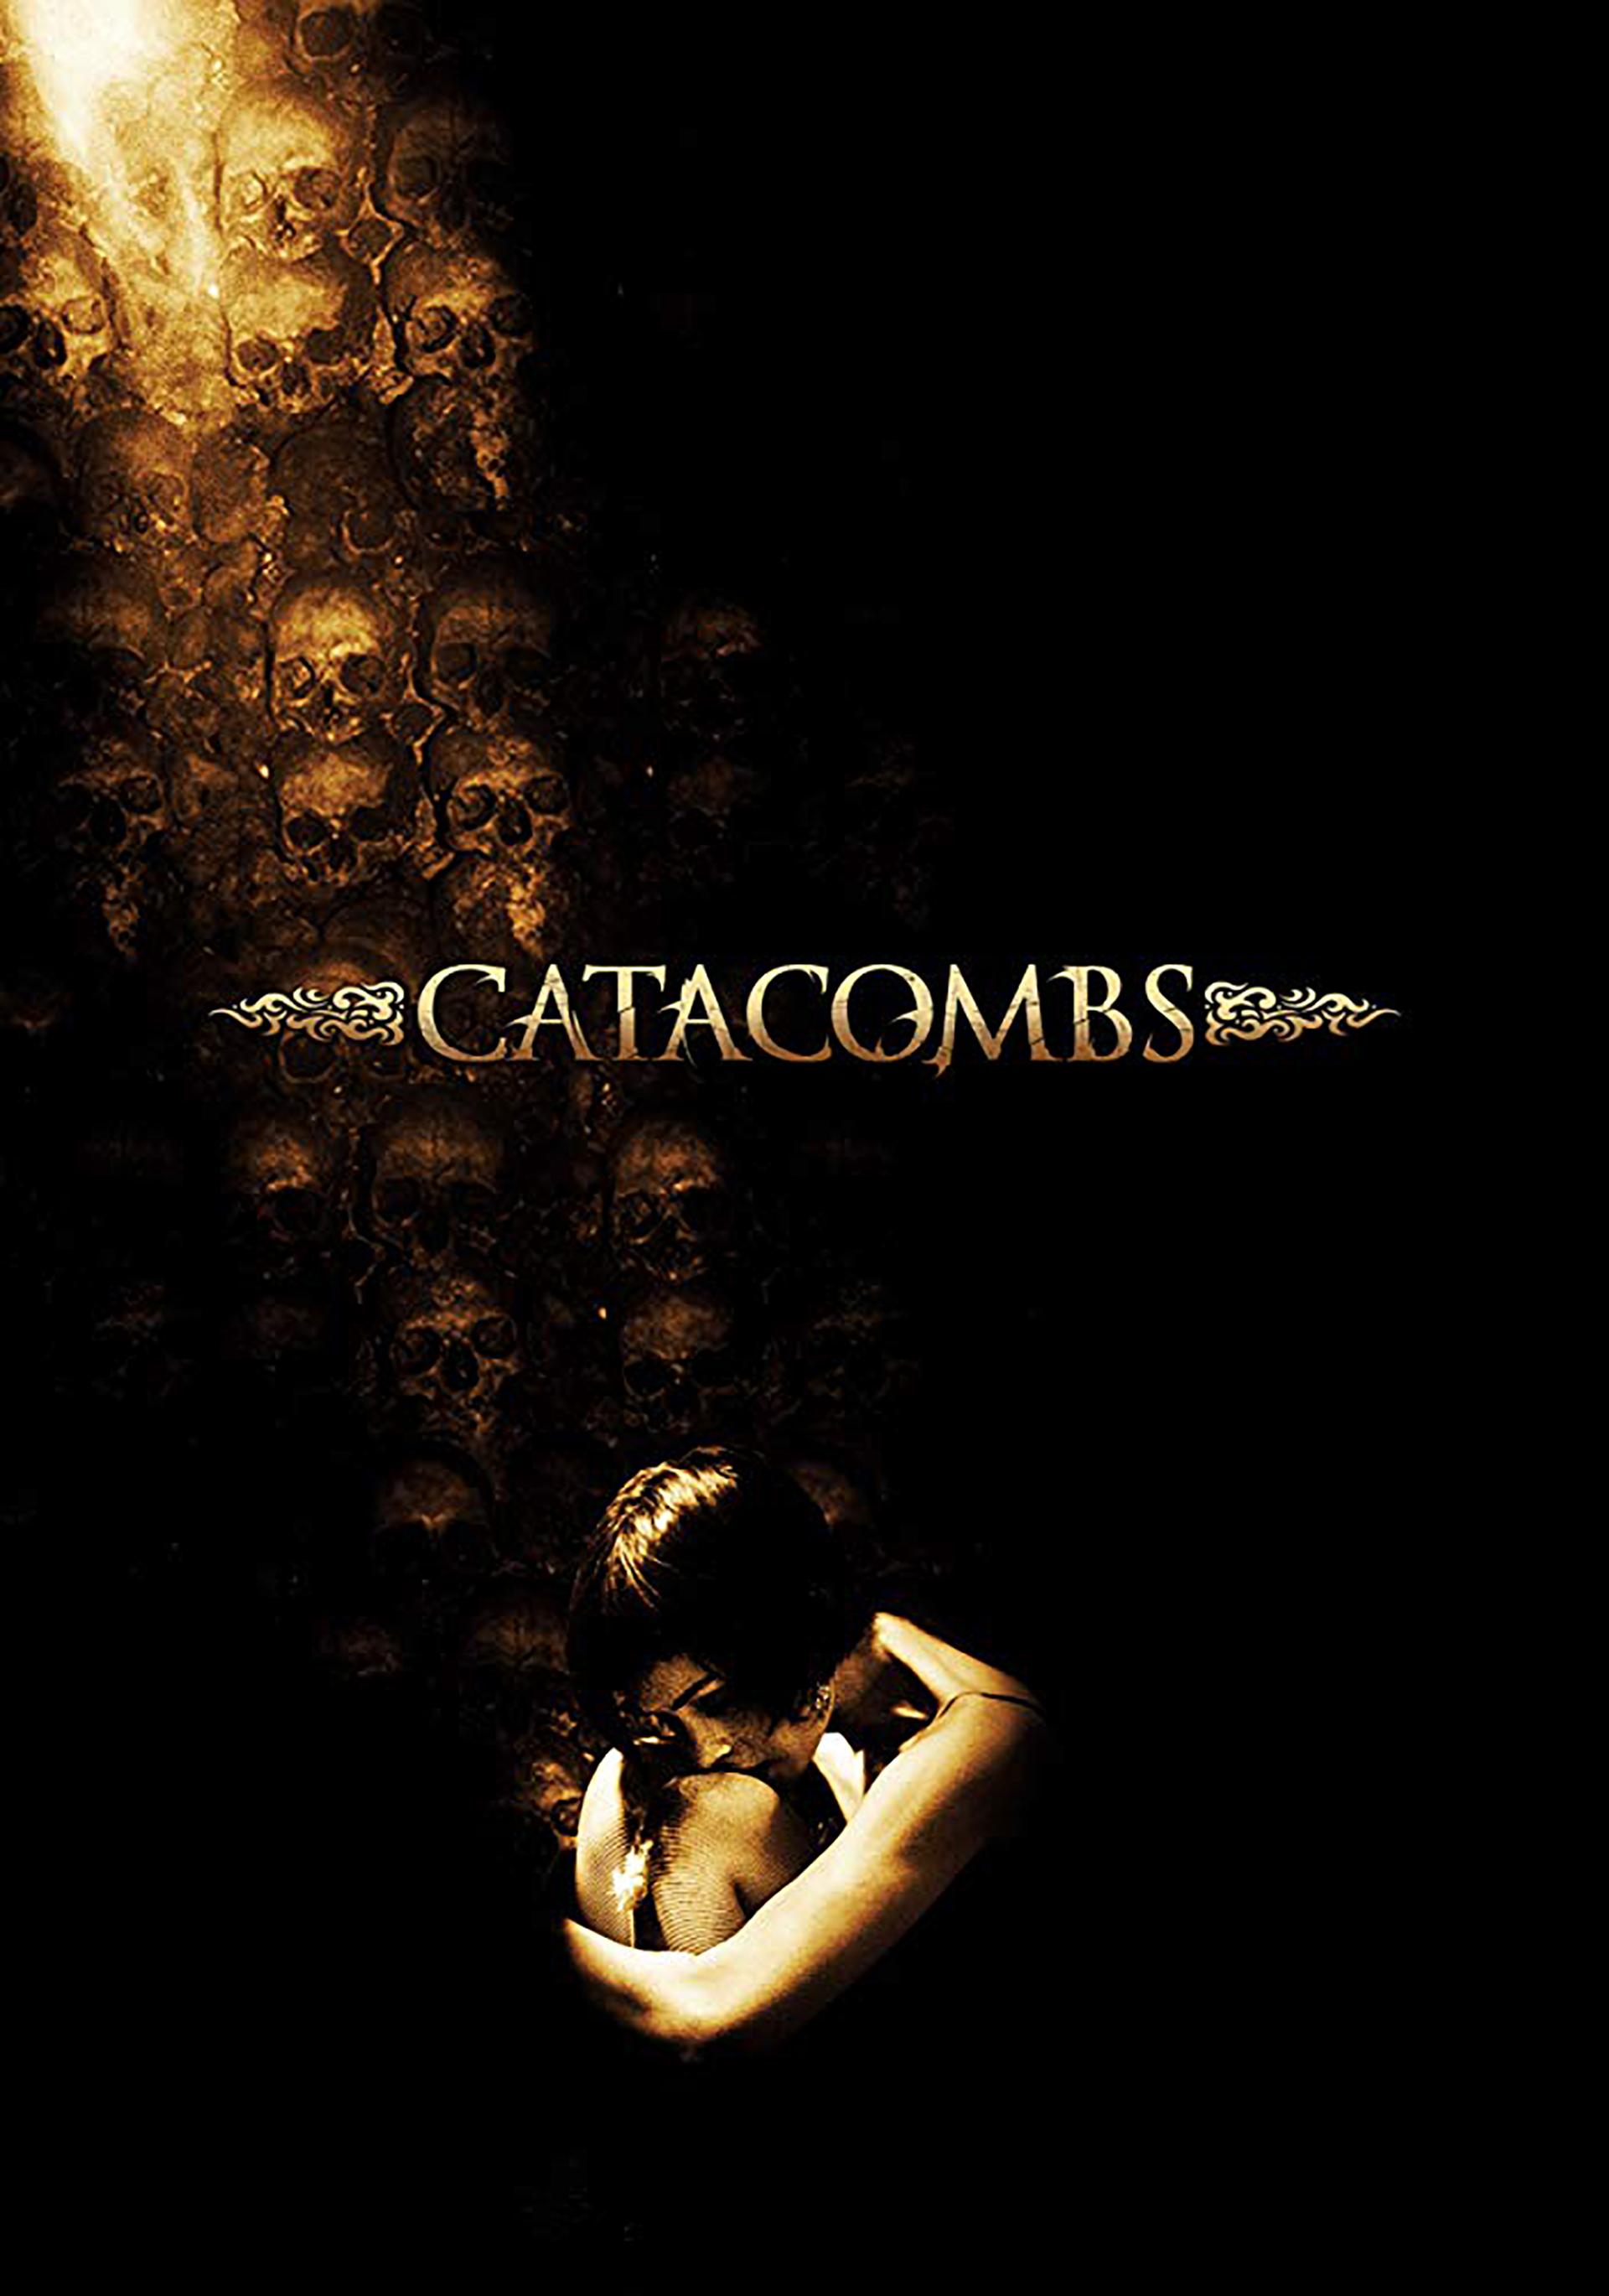 Catacombs EDIT.jpg